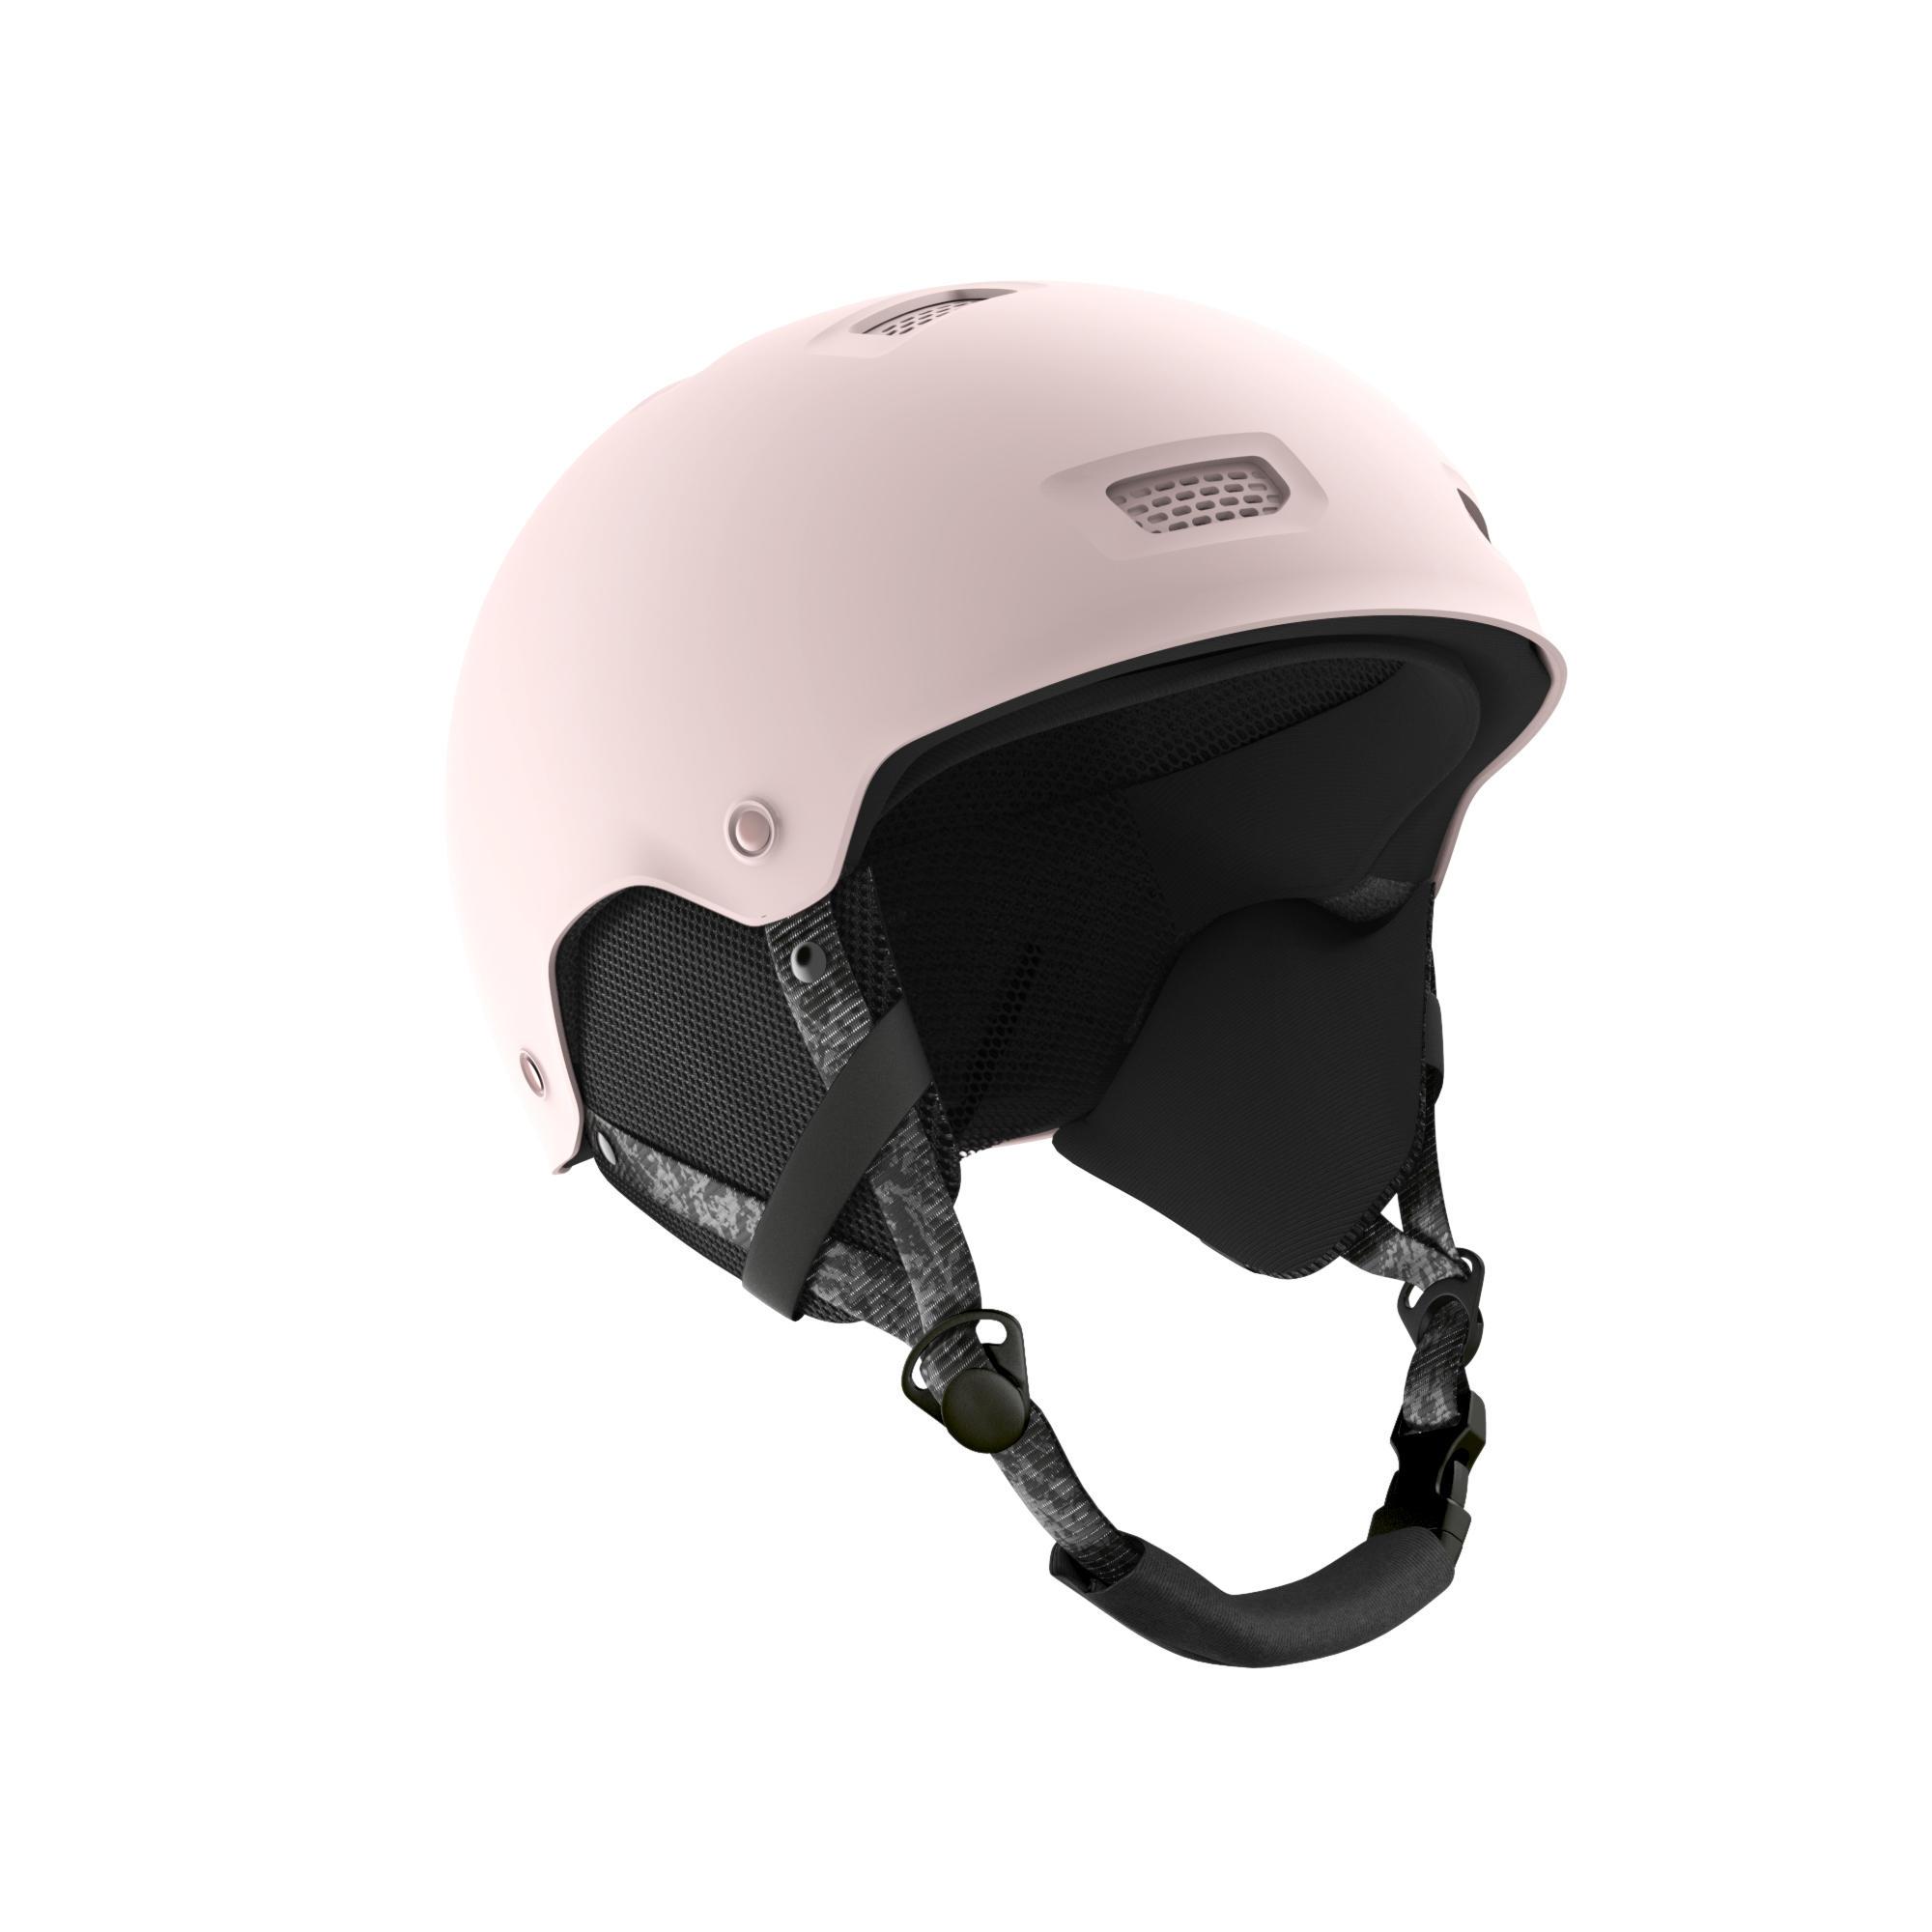 Cască Schi/snowboard H-FS 300 imagine